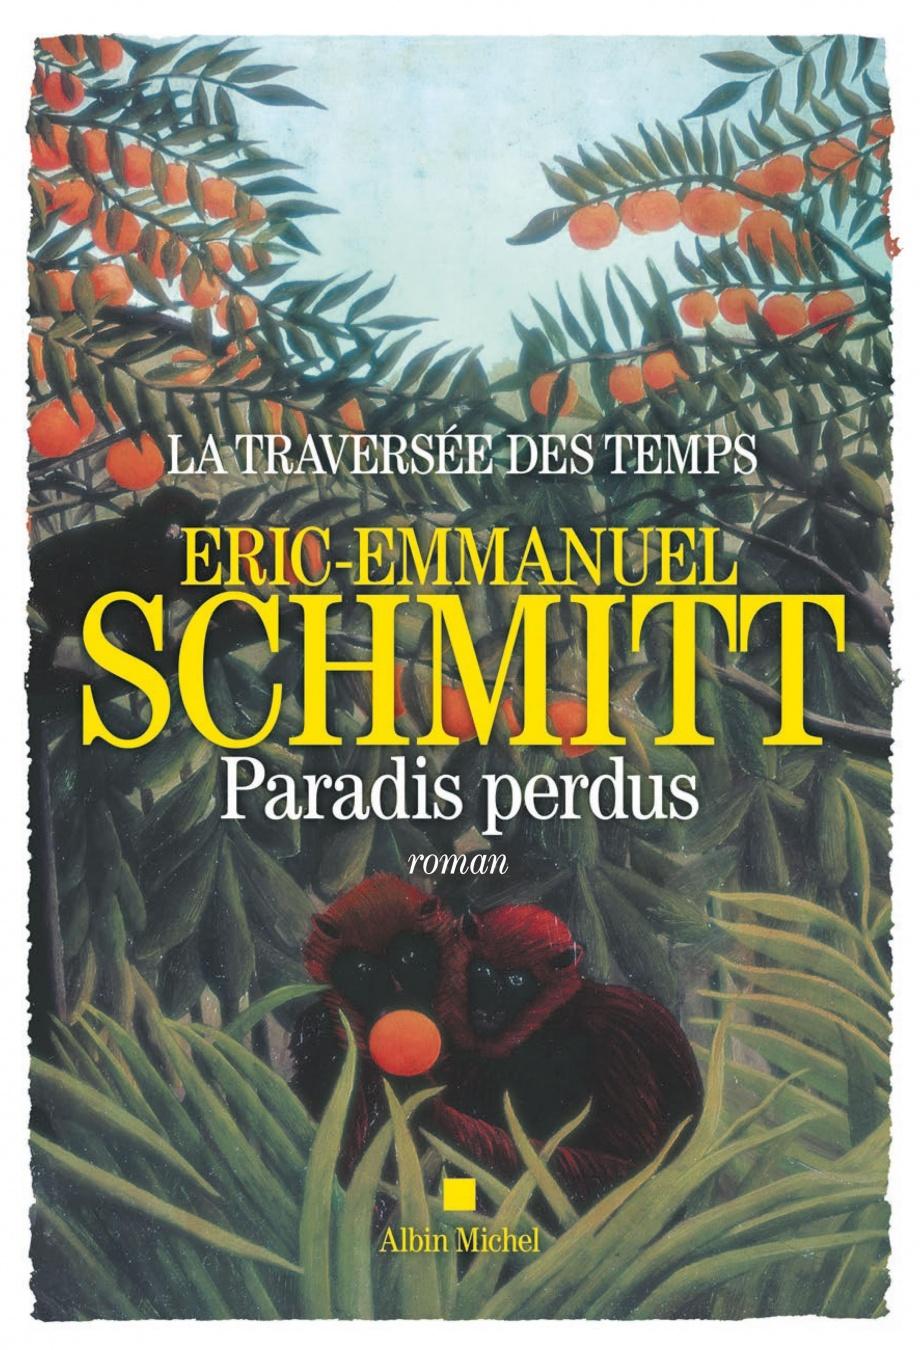 Éric-Emmanuel Schmidt